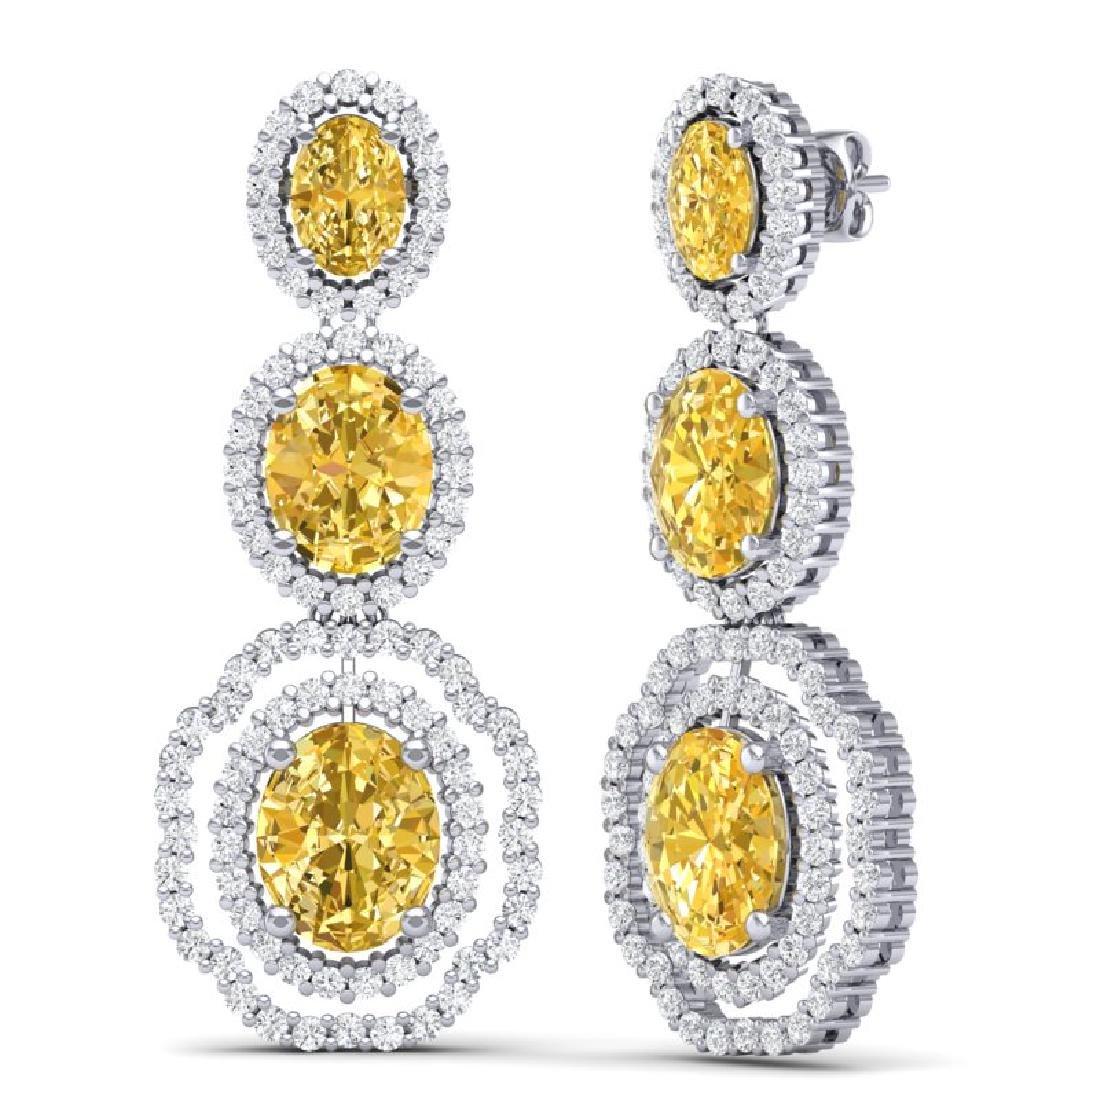 15.65 CTW Royalty Canary Citrine & VS Diamond Earrings - 3